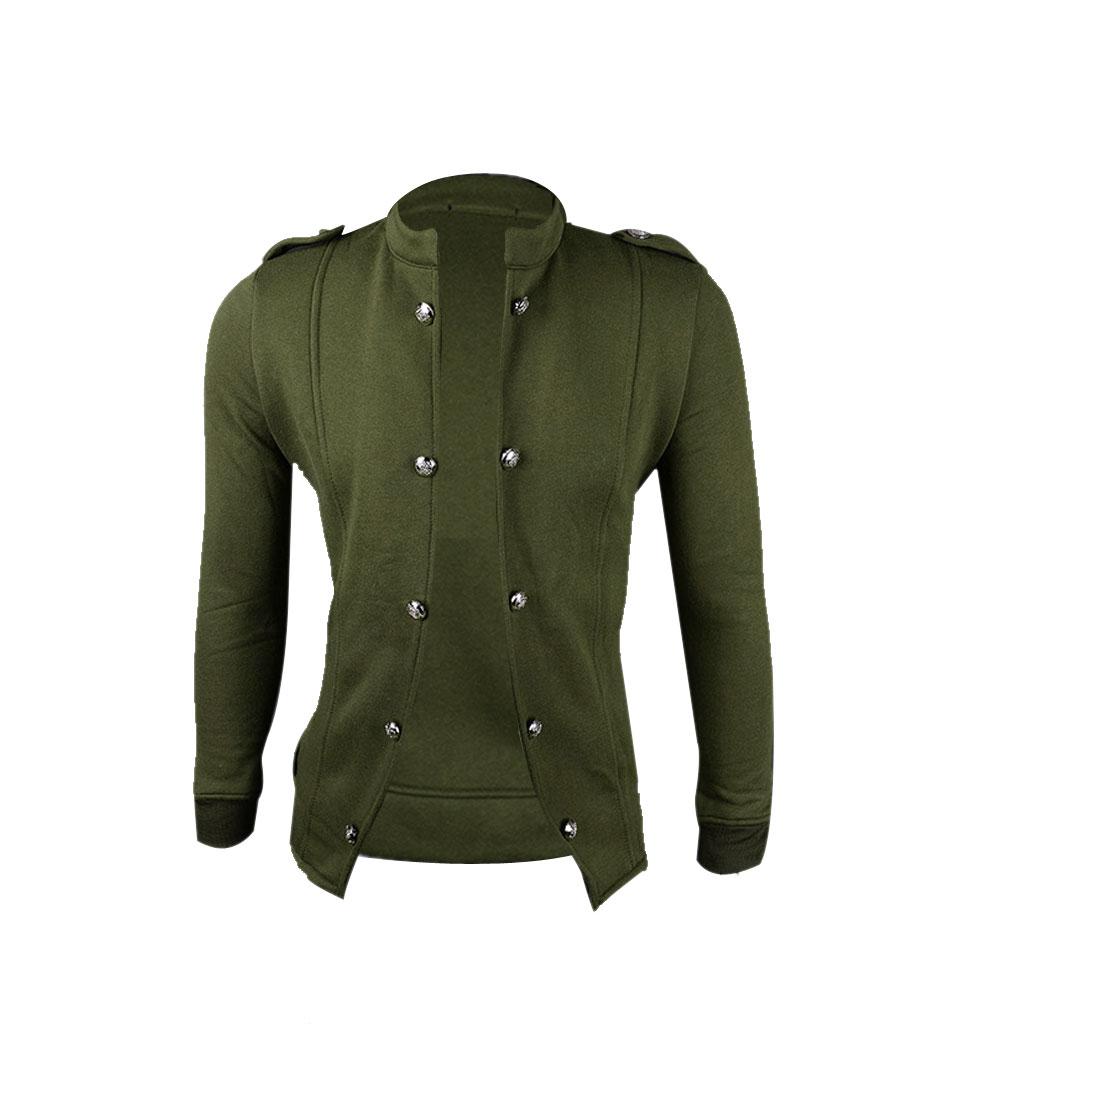 Men M Olive Green Long Sleeve Stand Collar Solid Color Slim Fit Jacket